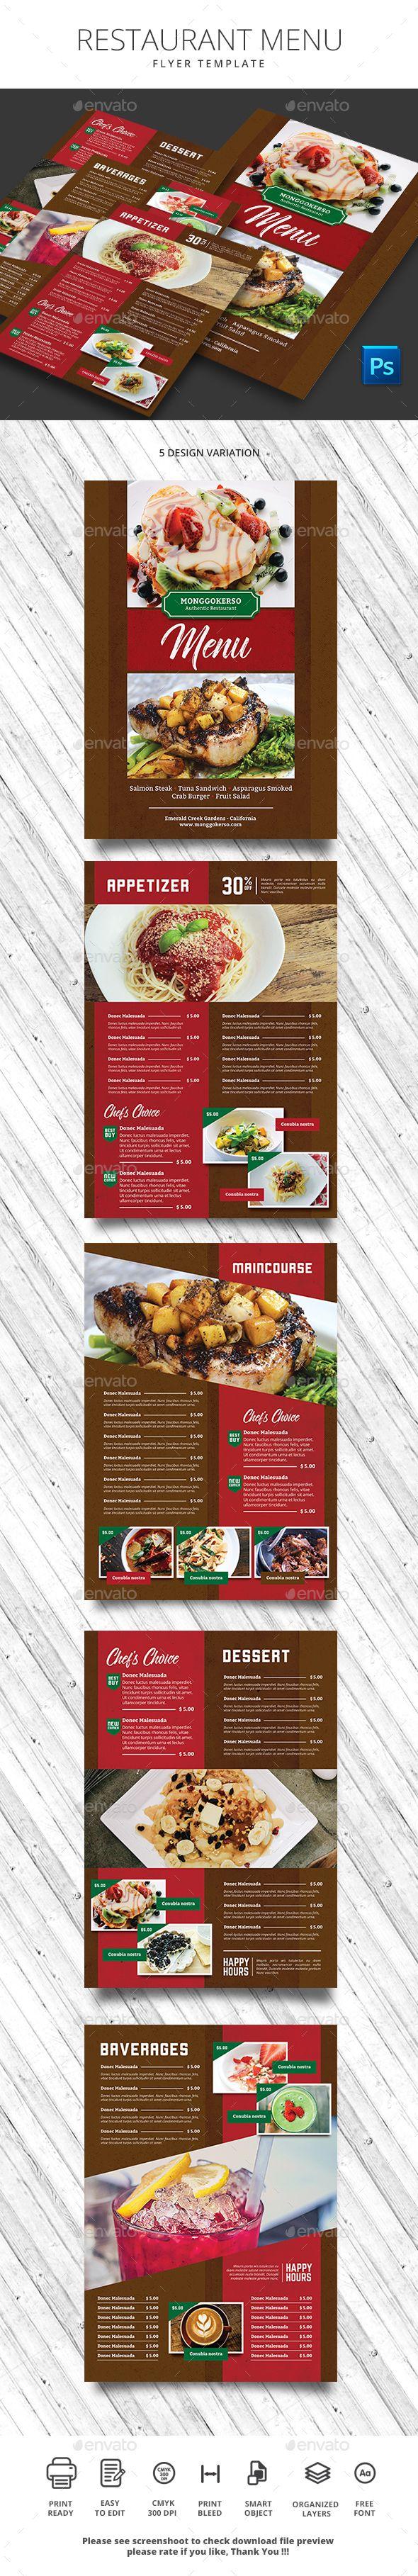 White apron menu warrington - Restaurant Menu